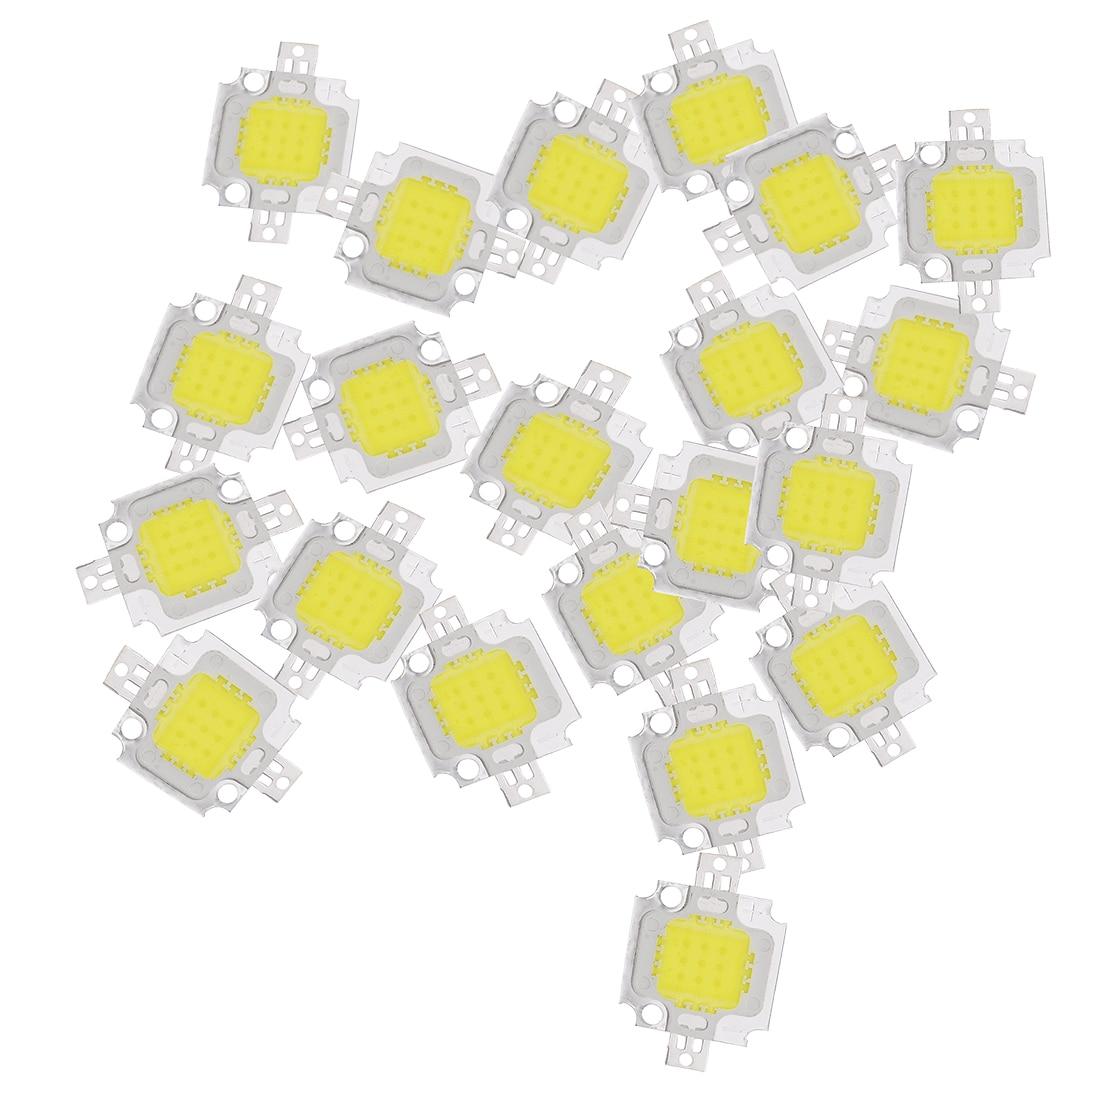 20PCS 10W LED Pure White High Power 1100LM LED Lamp SMD Chip light Bulb DC 9-12V